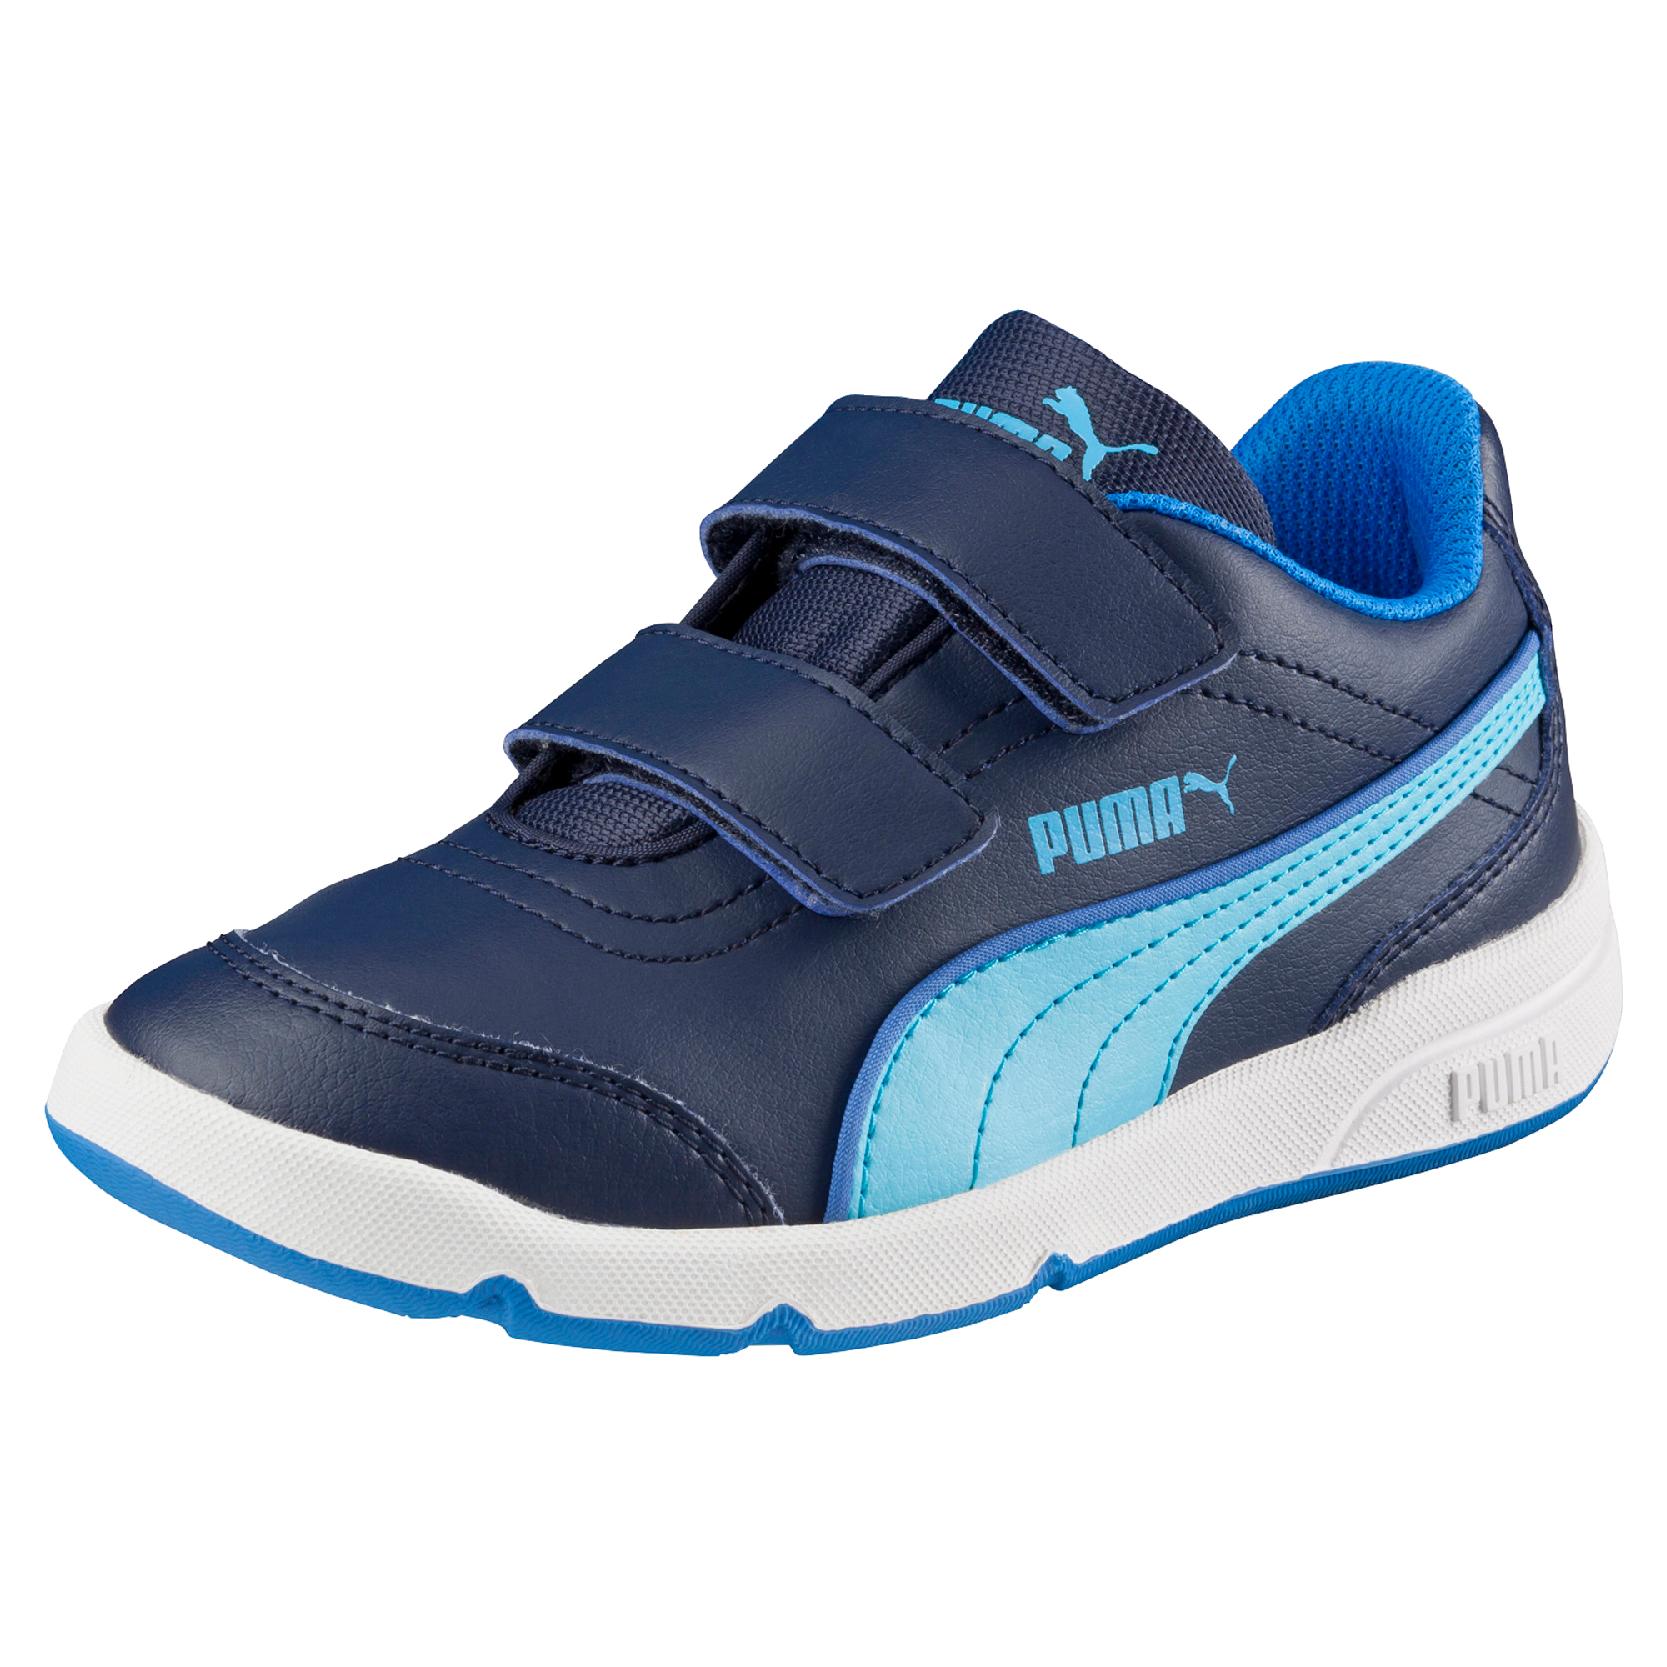 8bc5d3f3b828 Puma Chlapčenské tenisky Stepfleex FS SL V Inf Peacoat-Blue Atoll ...